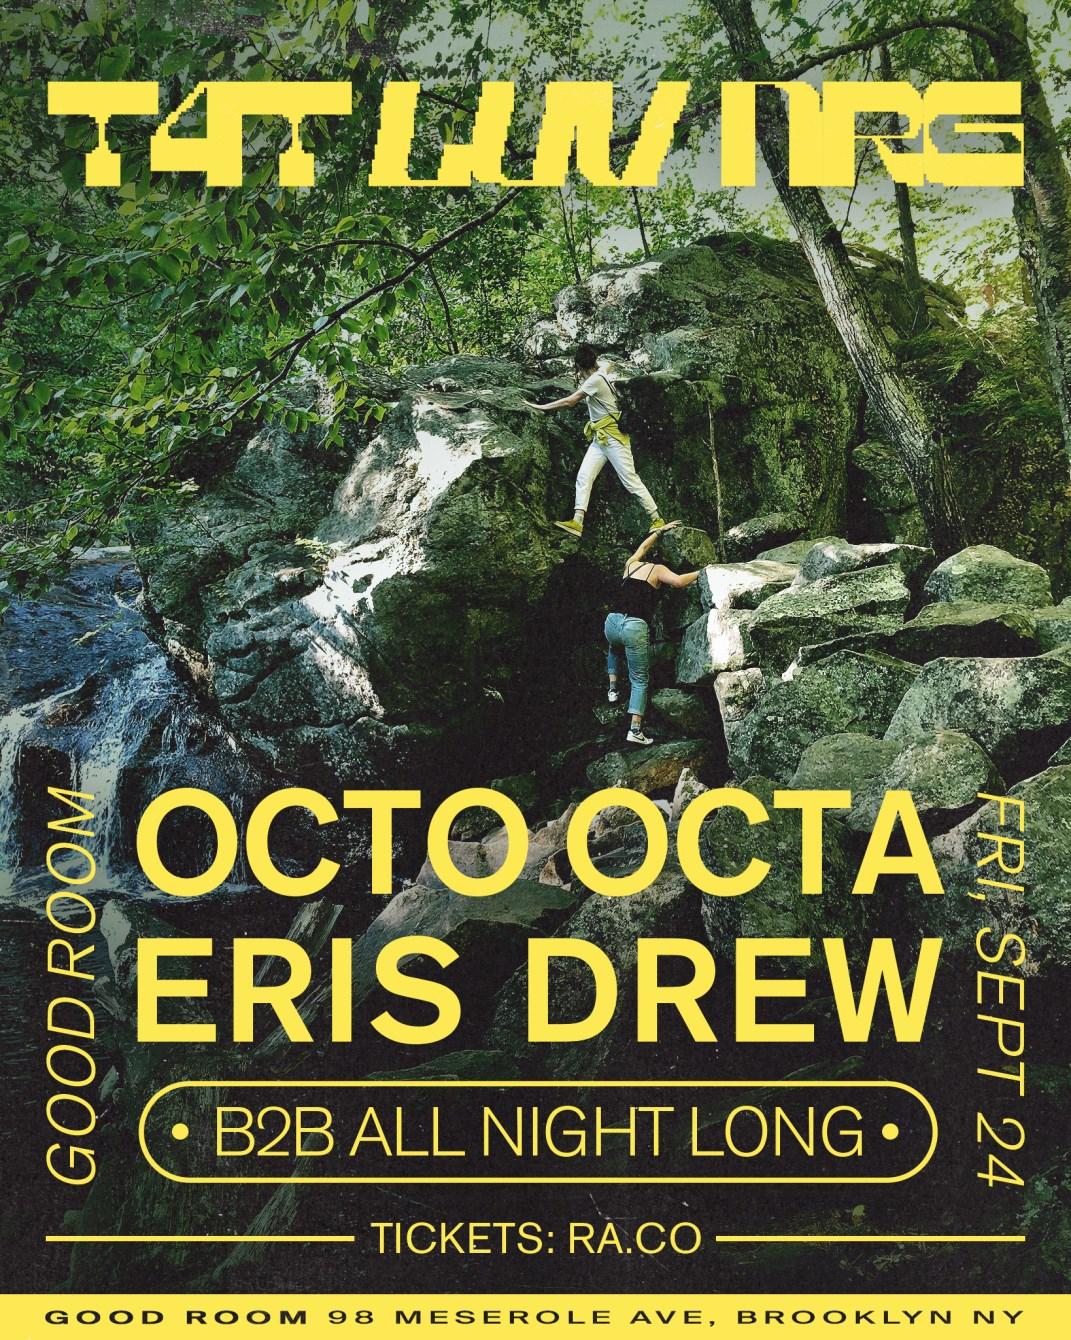 T4T LUV NRG - Eris Drew b2b Octo Octa - All Night Long - Flyer front